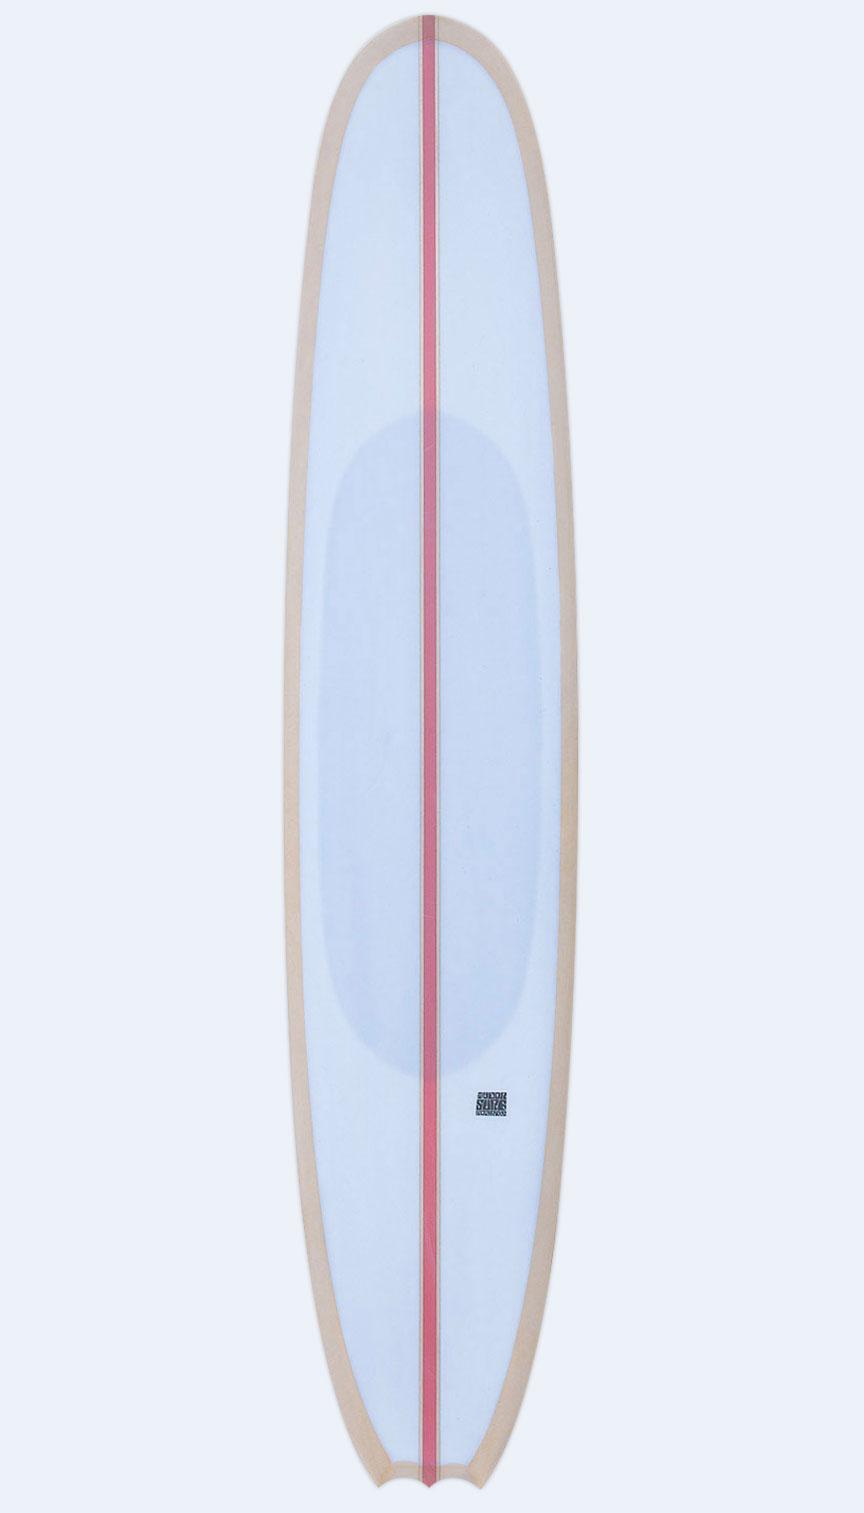 tudor-surfboards-batman